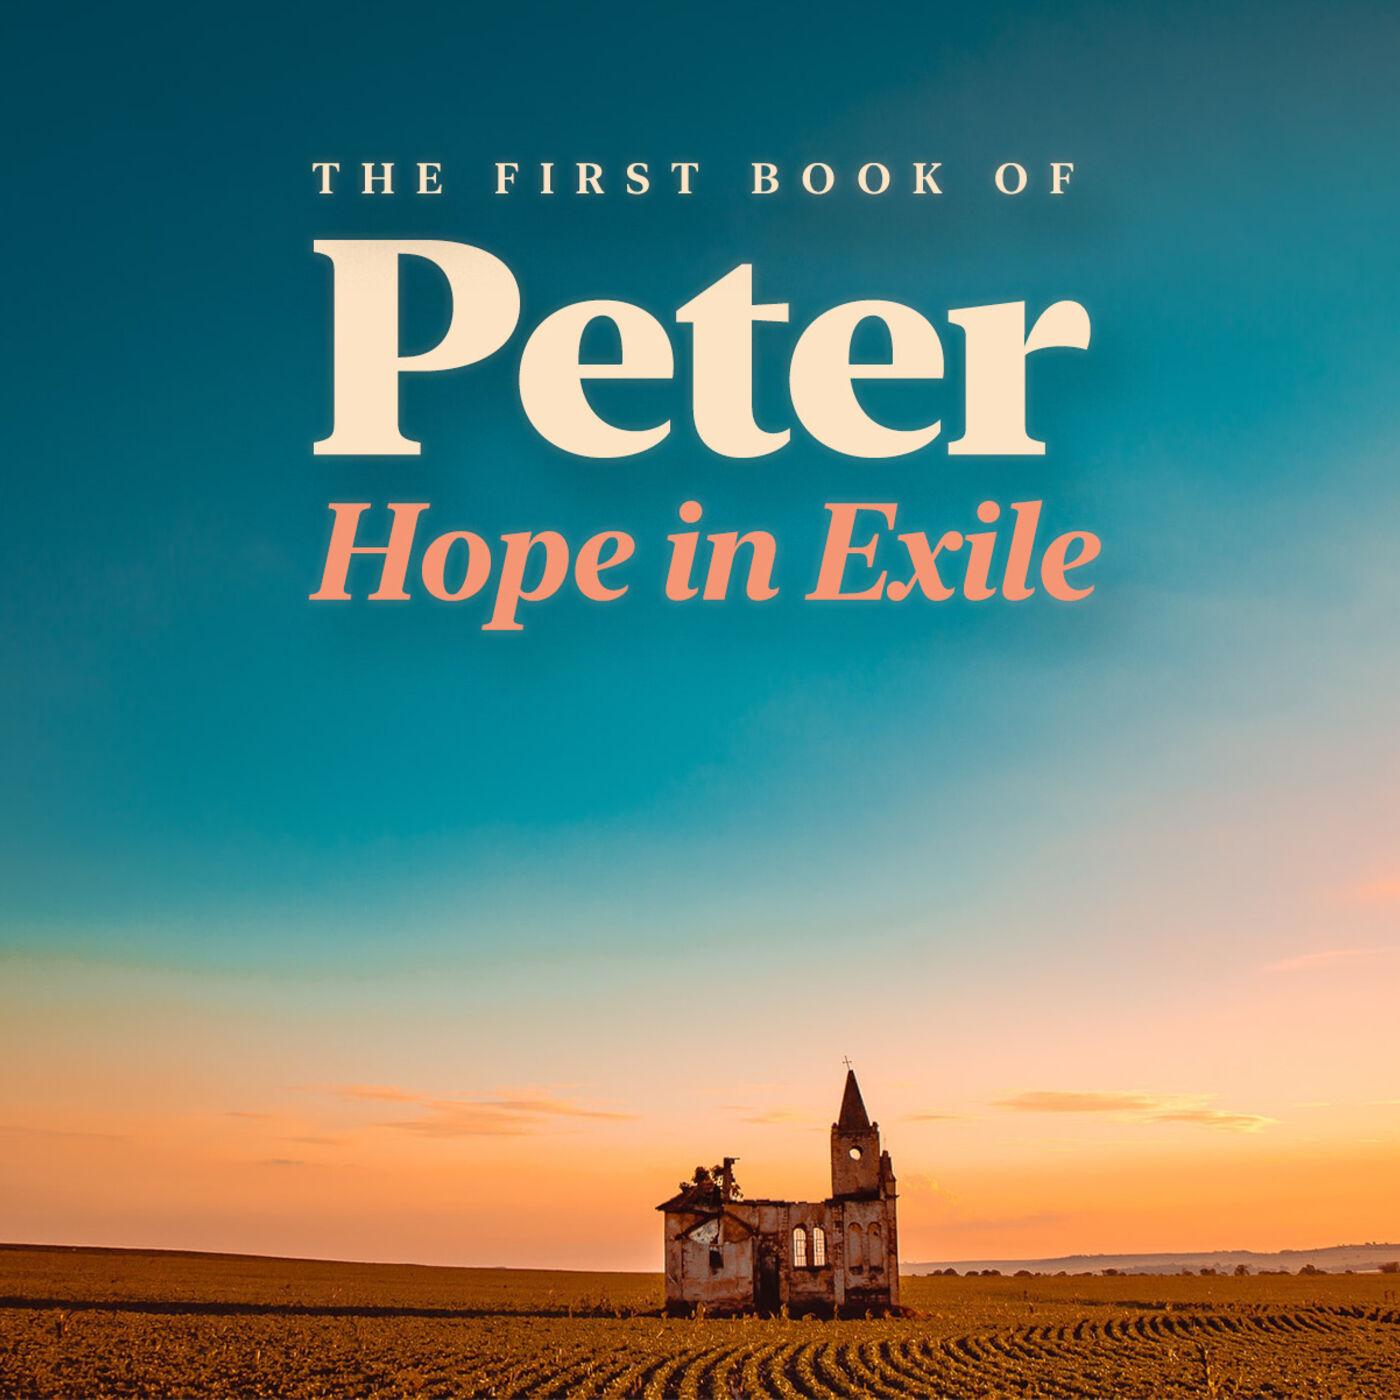 1 Peter 5:1-14 | Pastor Dale Stinson